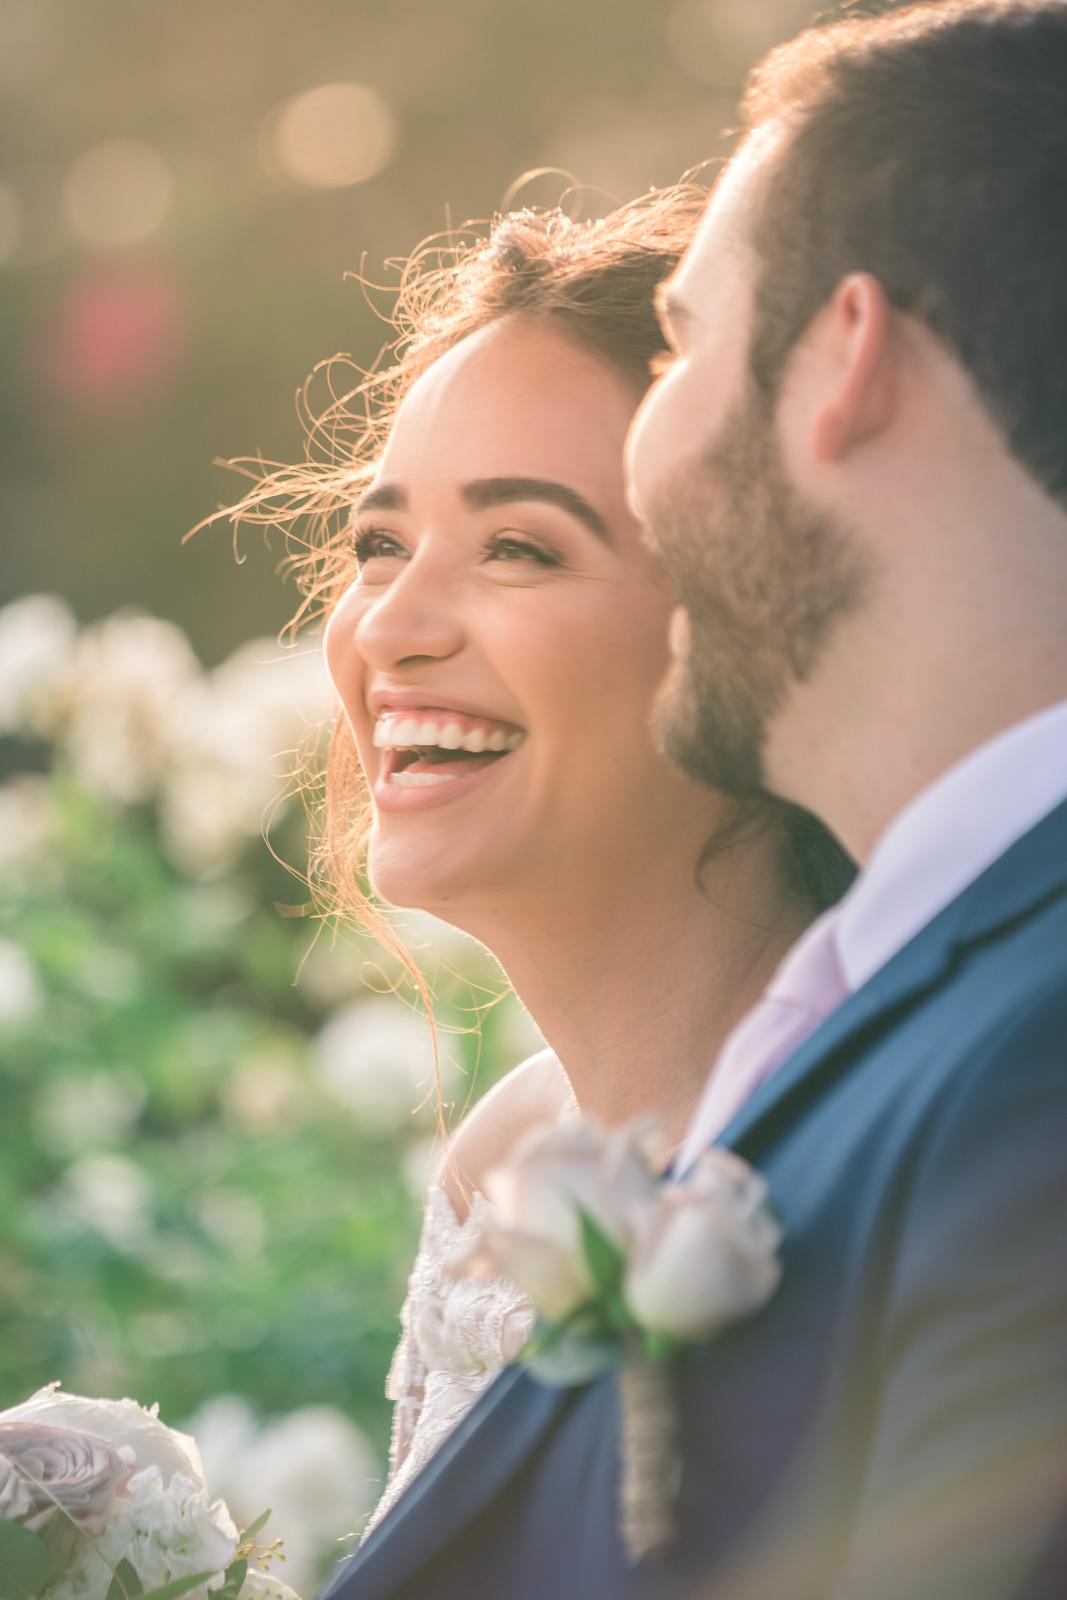 227_Angel-Brea-Orange-County_Joseph-Barber-Wedding-Photography.jpg